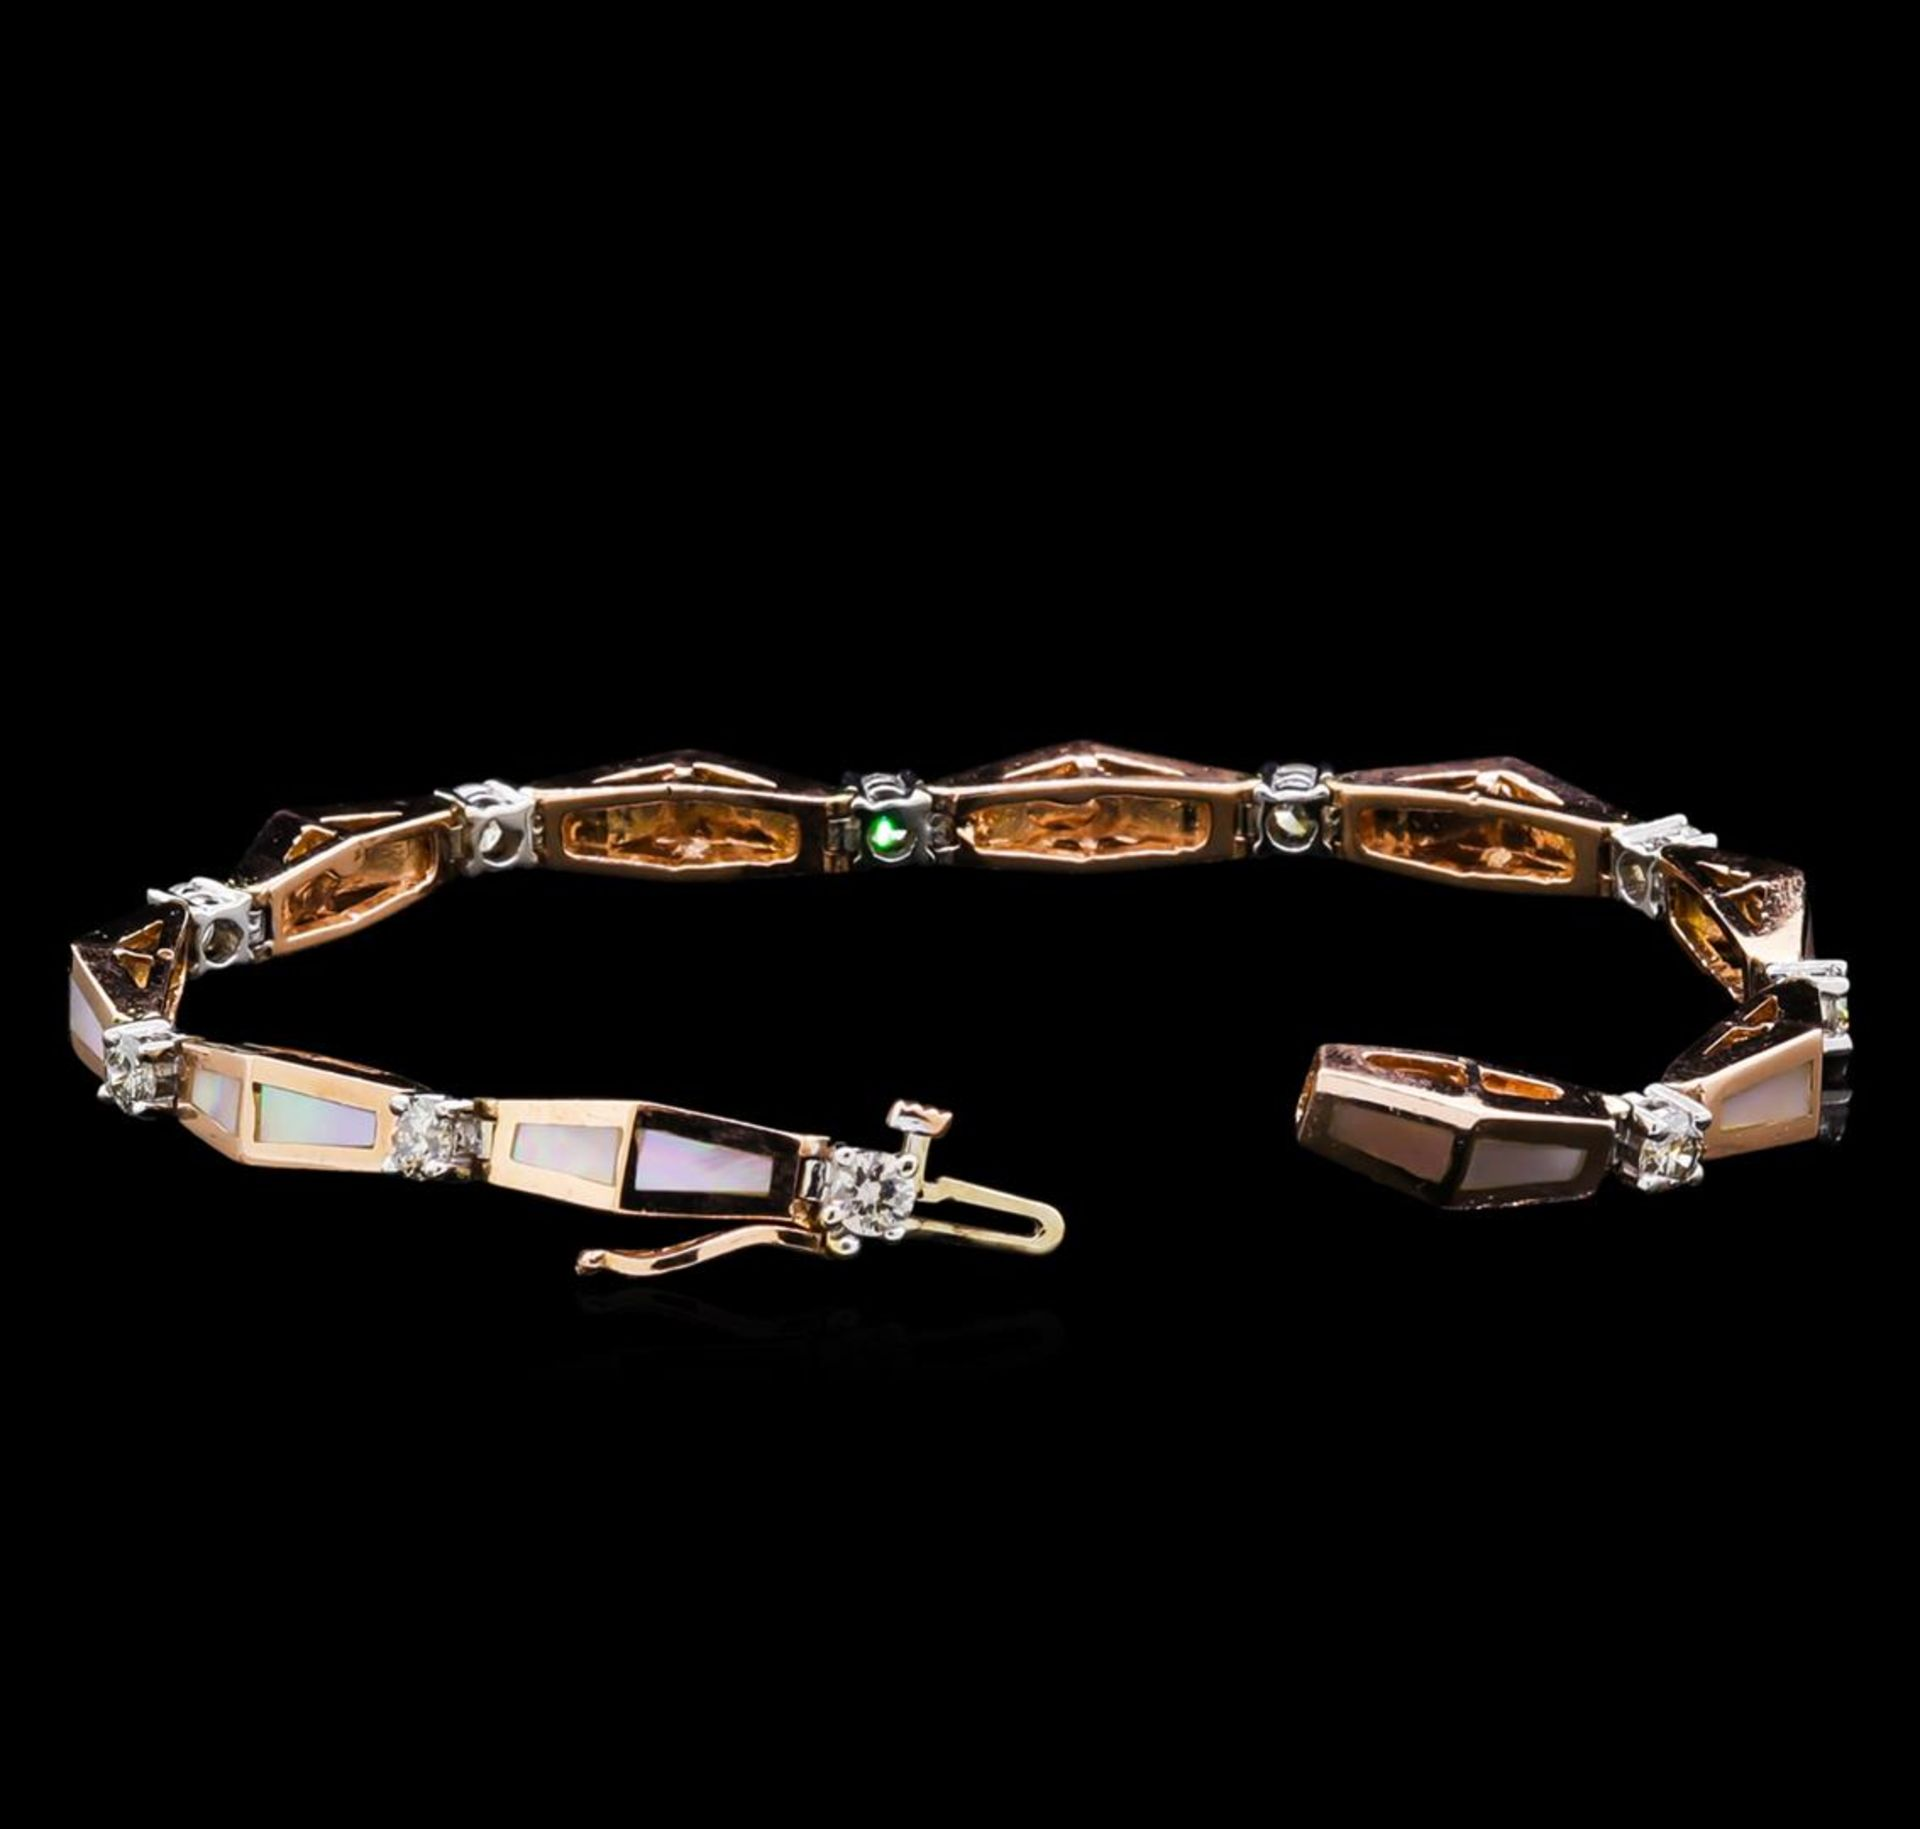 14KT Two-Tone Gold 0.67 ctw Diamond Bracelet - Image 3 of 4